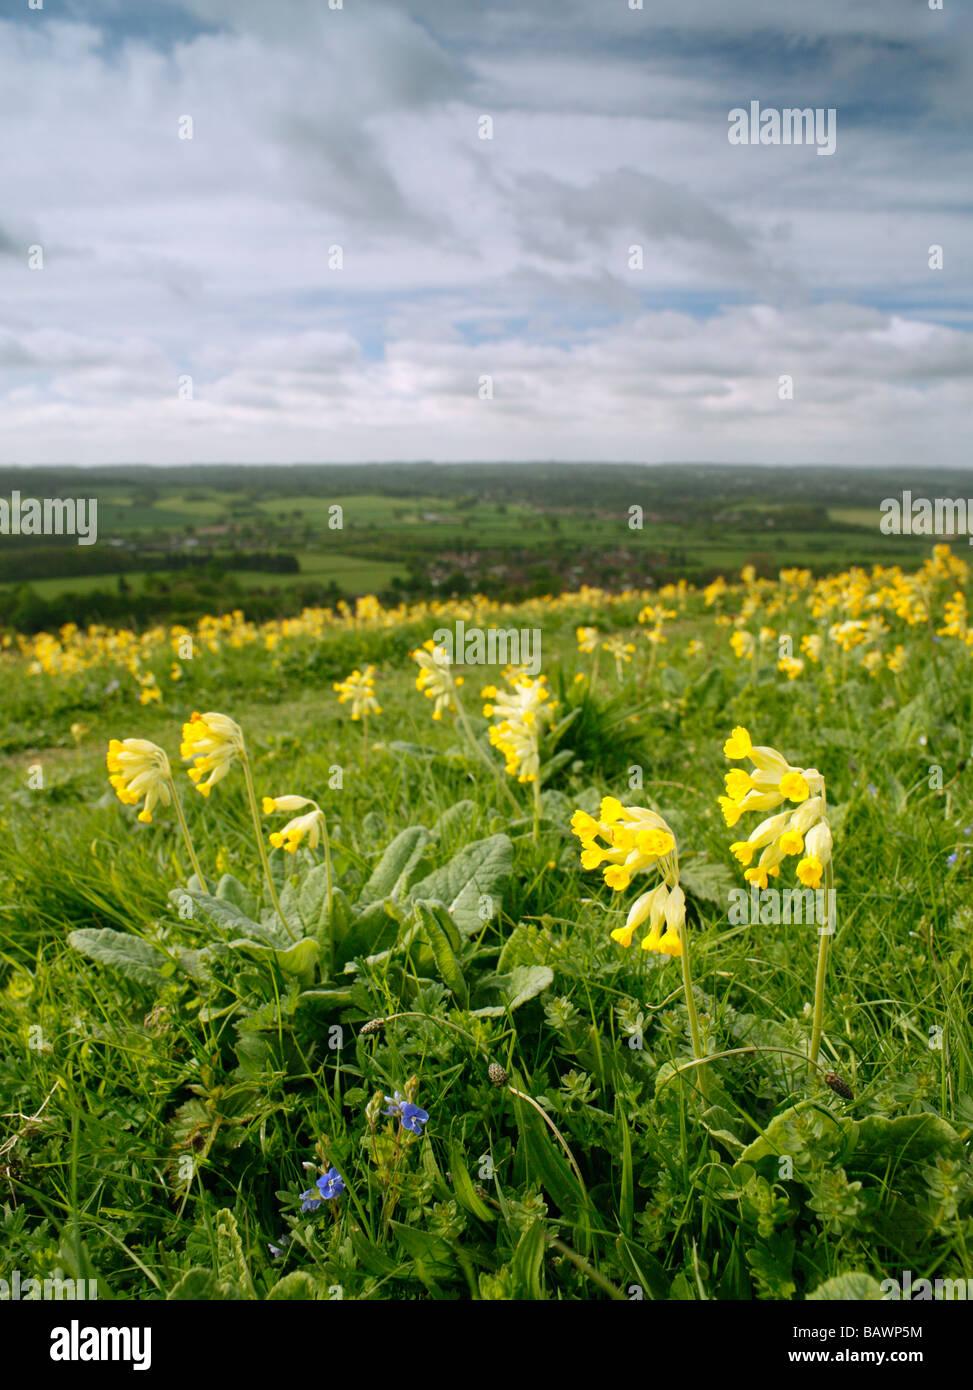 Cowslip Primula veris on the North Downs, overlooking Sevenoaks, Kent, England, UK. Stock Photo